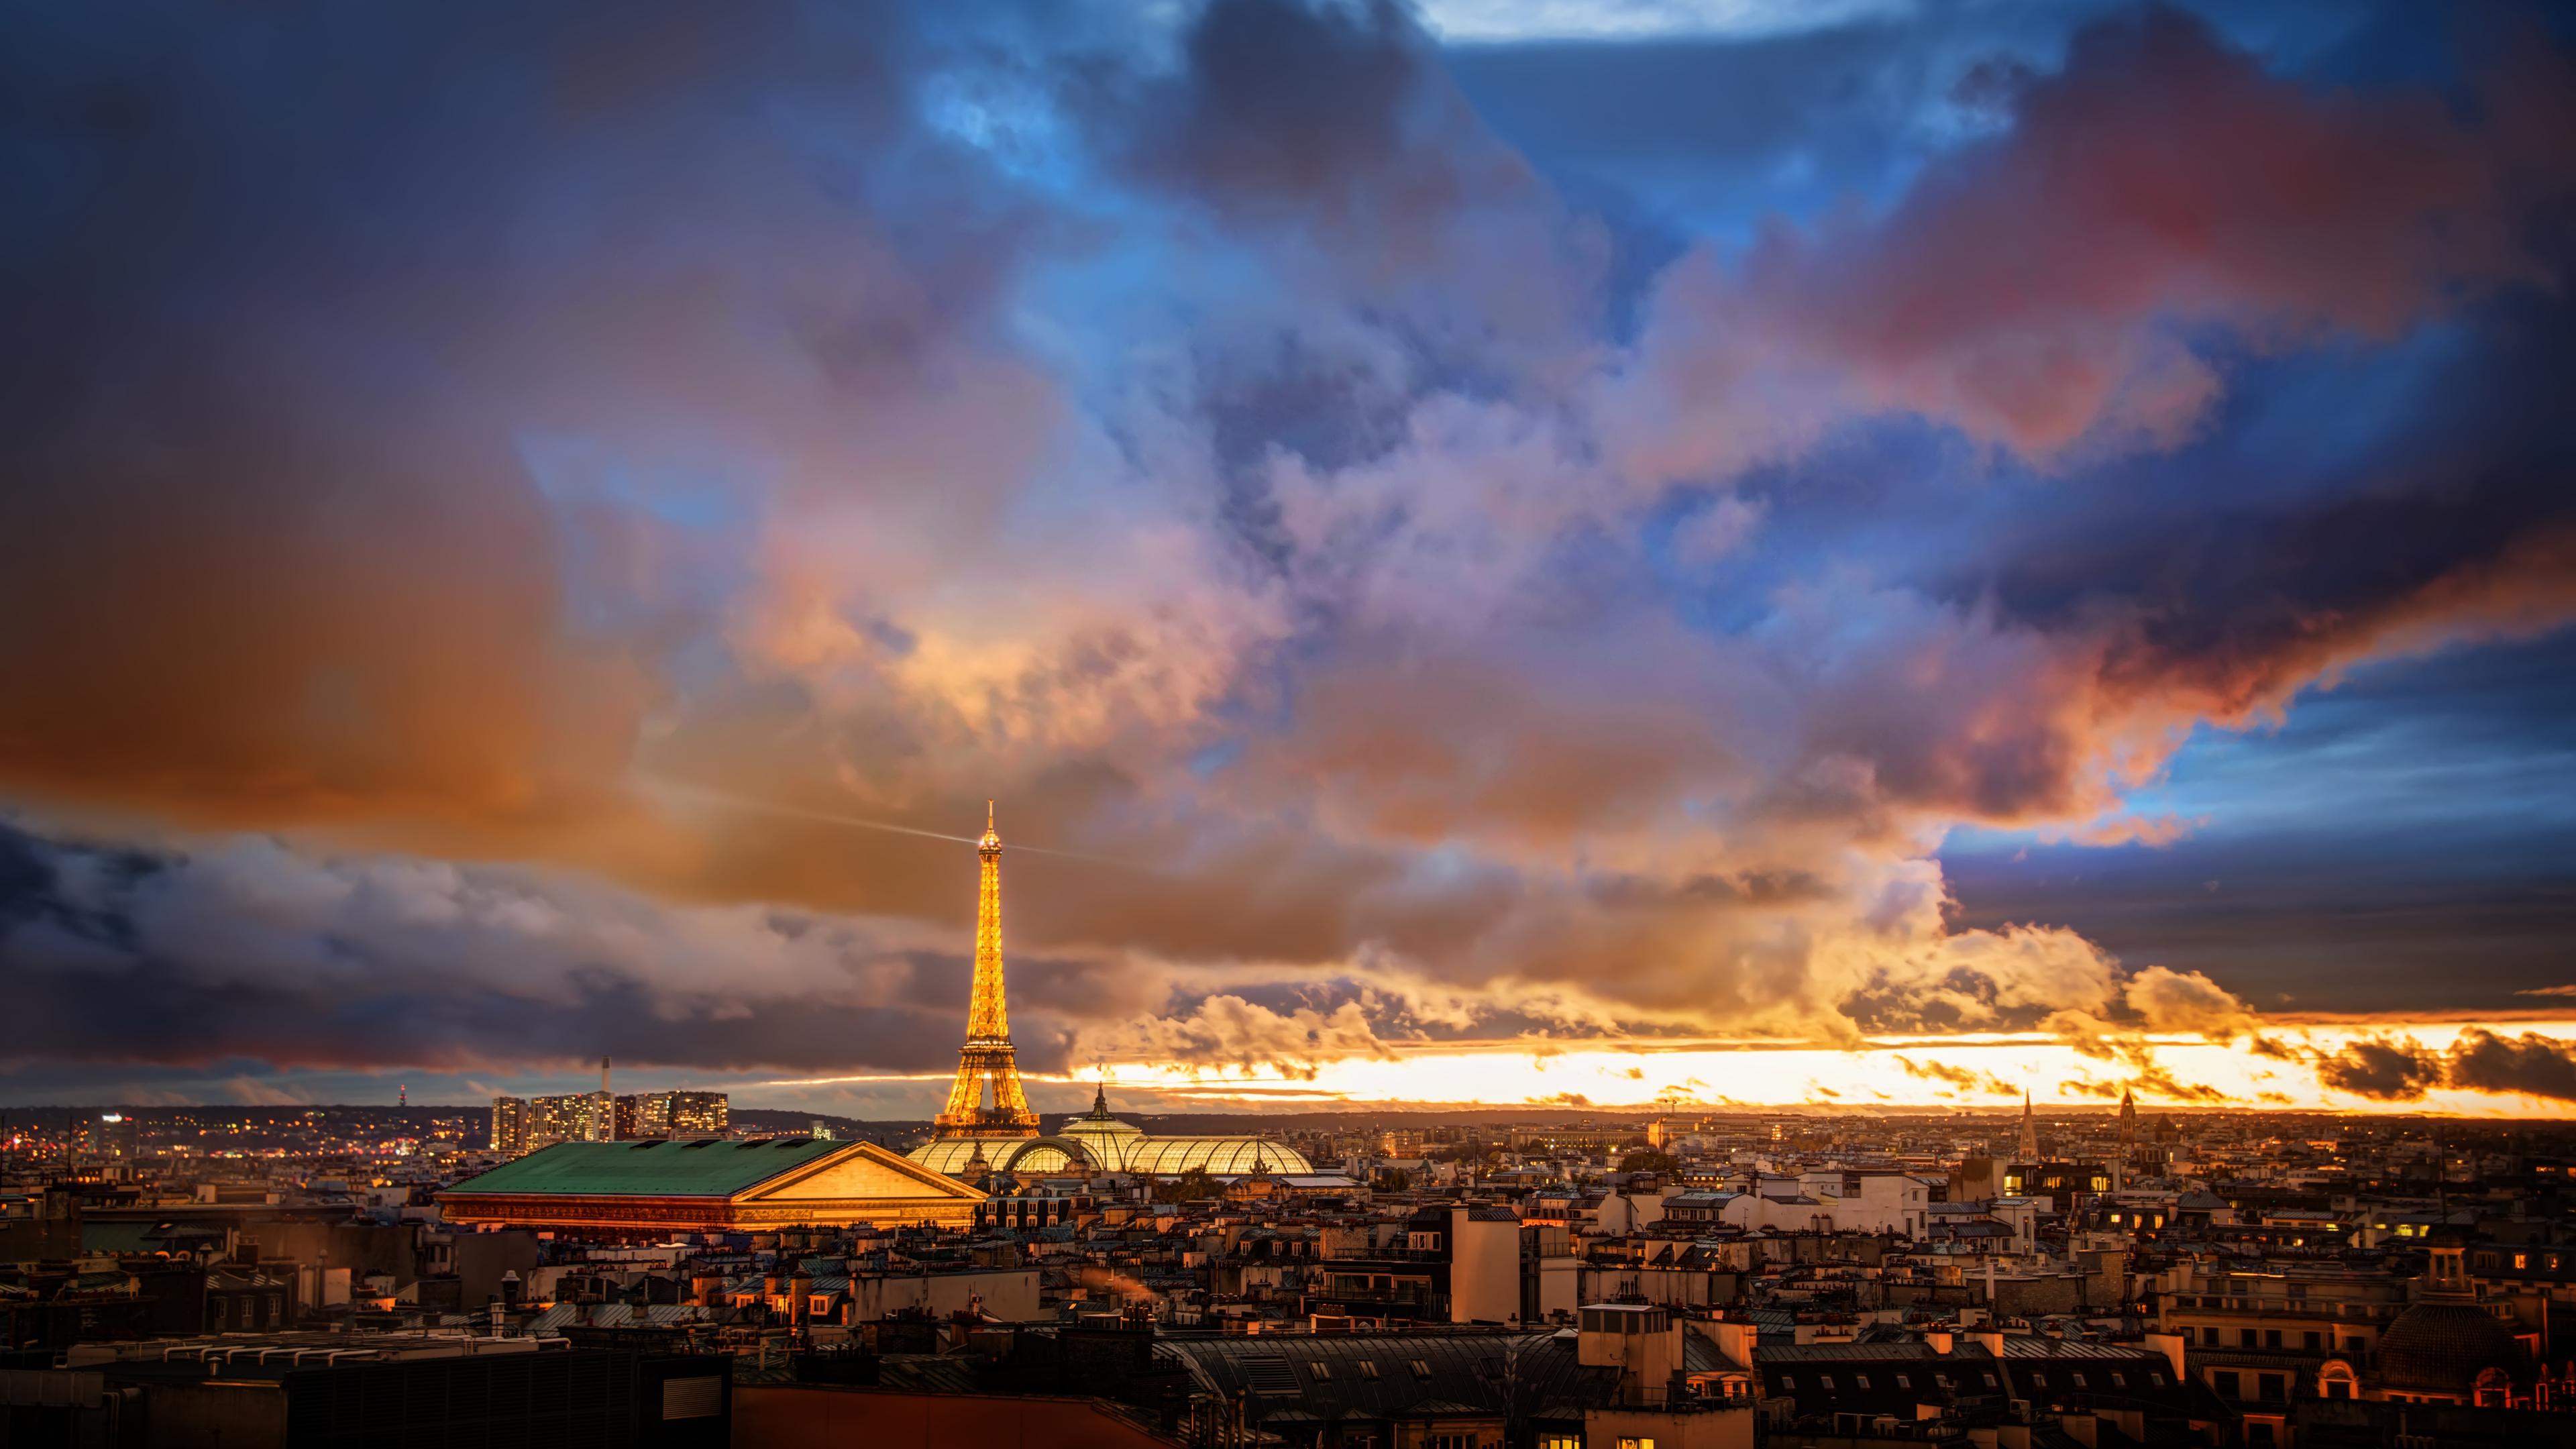 eiffel tower view from far away 4k 1540751488 - Eiffel Tower View From Far Away 4k - world wallpapers, paris wallpapers, hd-wallpapers, france wallpapers, eiffel tower wallpapers, 8k wallpapers, 5k wallpapers, 4k-wallpapers